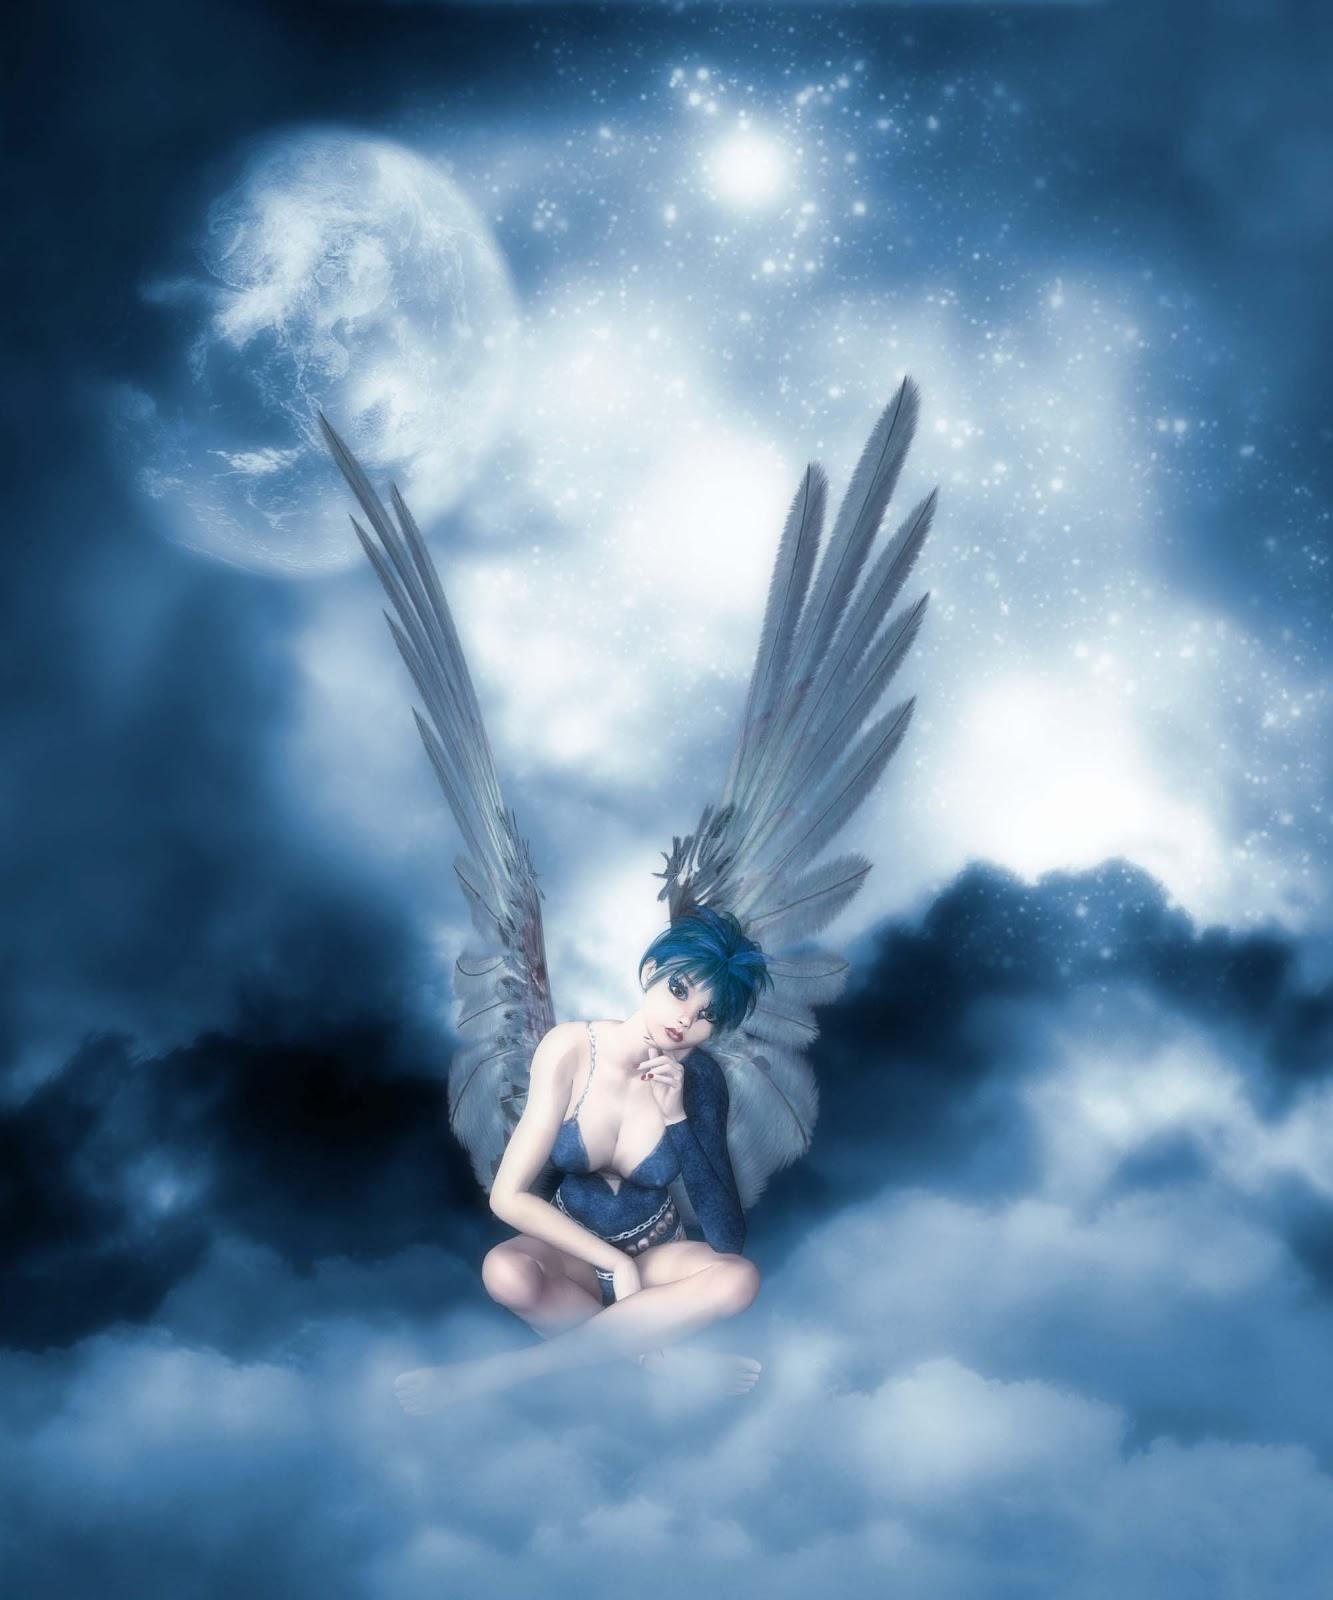 Http Www Fanpop Com Clubs Blue Images 34482609 Title Angel Sleeps On Blue Cloud Photo